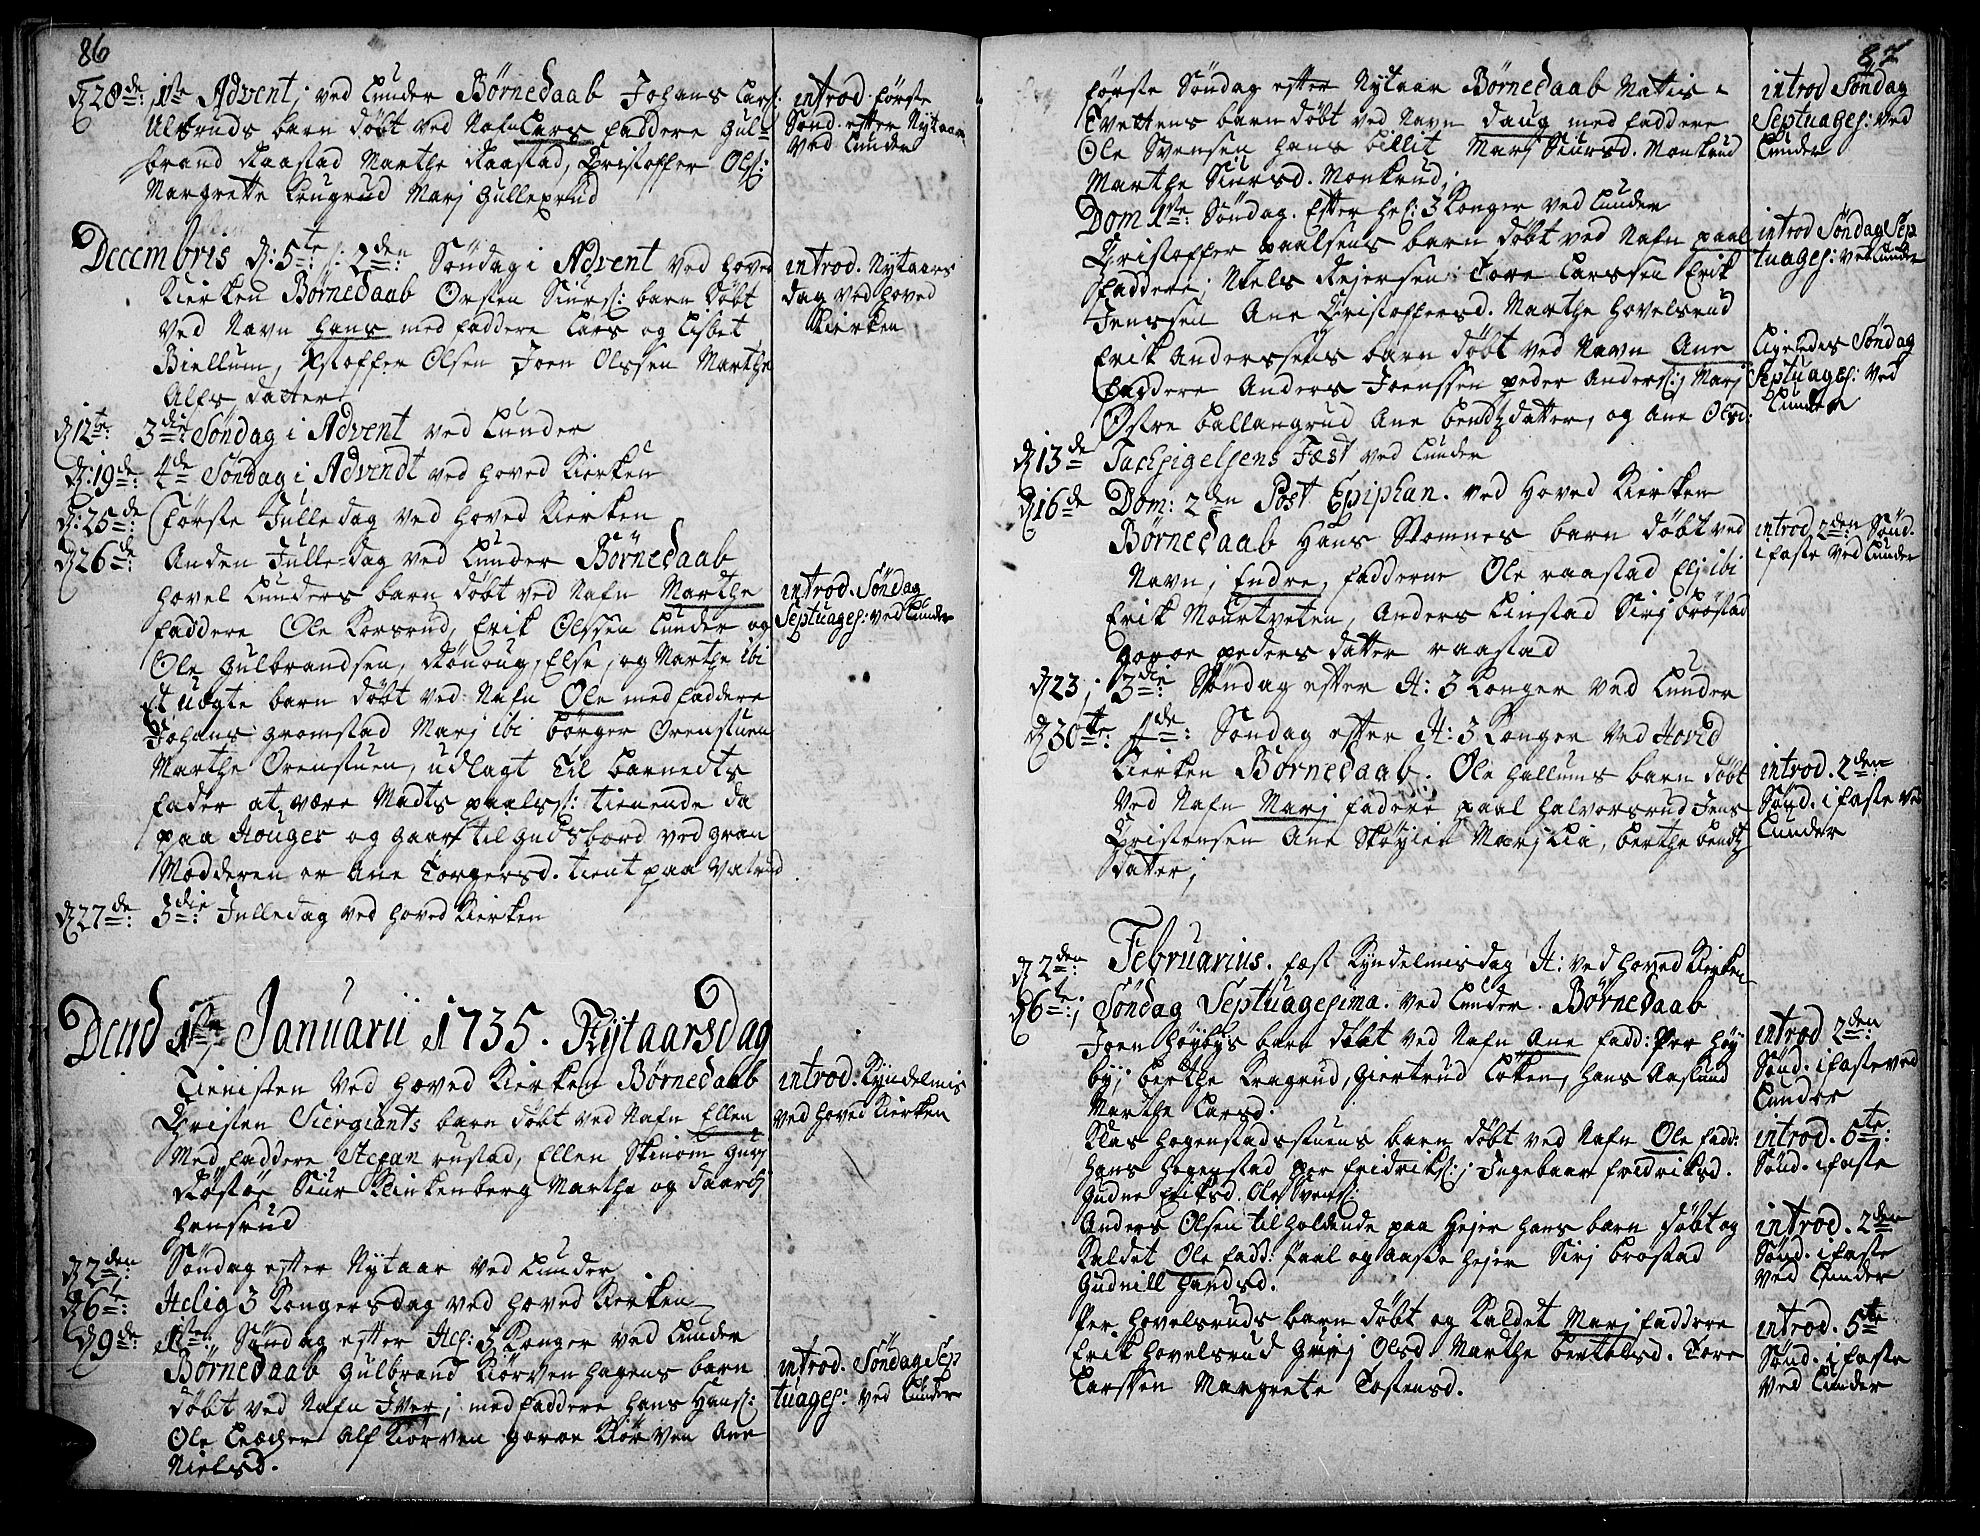 SAH, Jevnaker prestekontor, Ministerialbok nr. 2, 1725-1751, s. 86-87